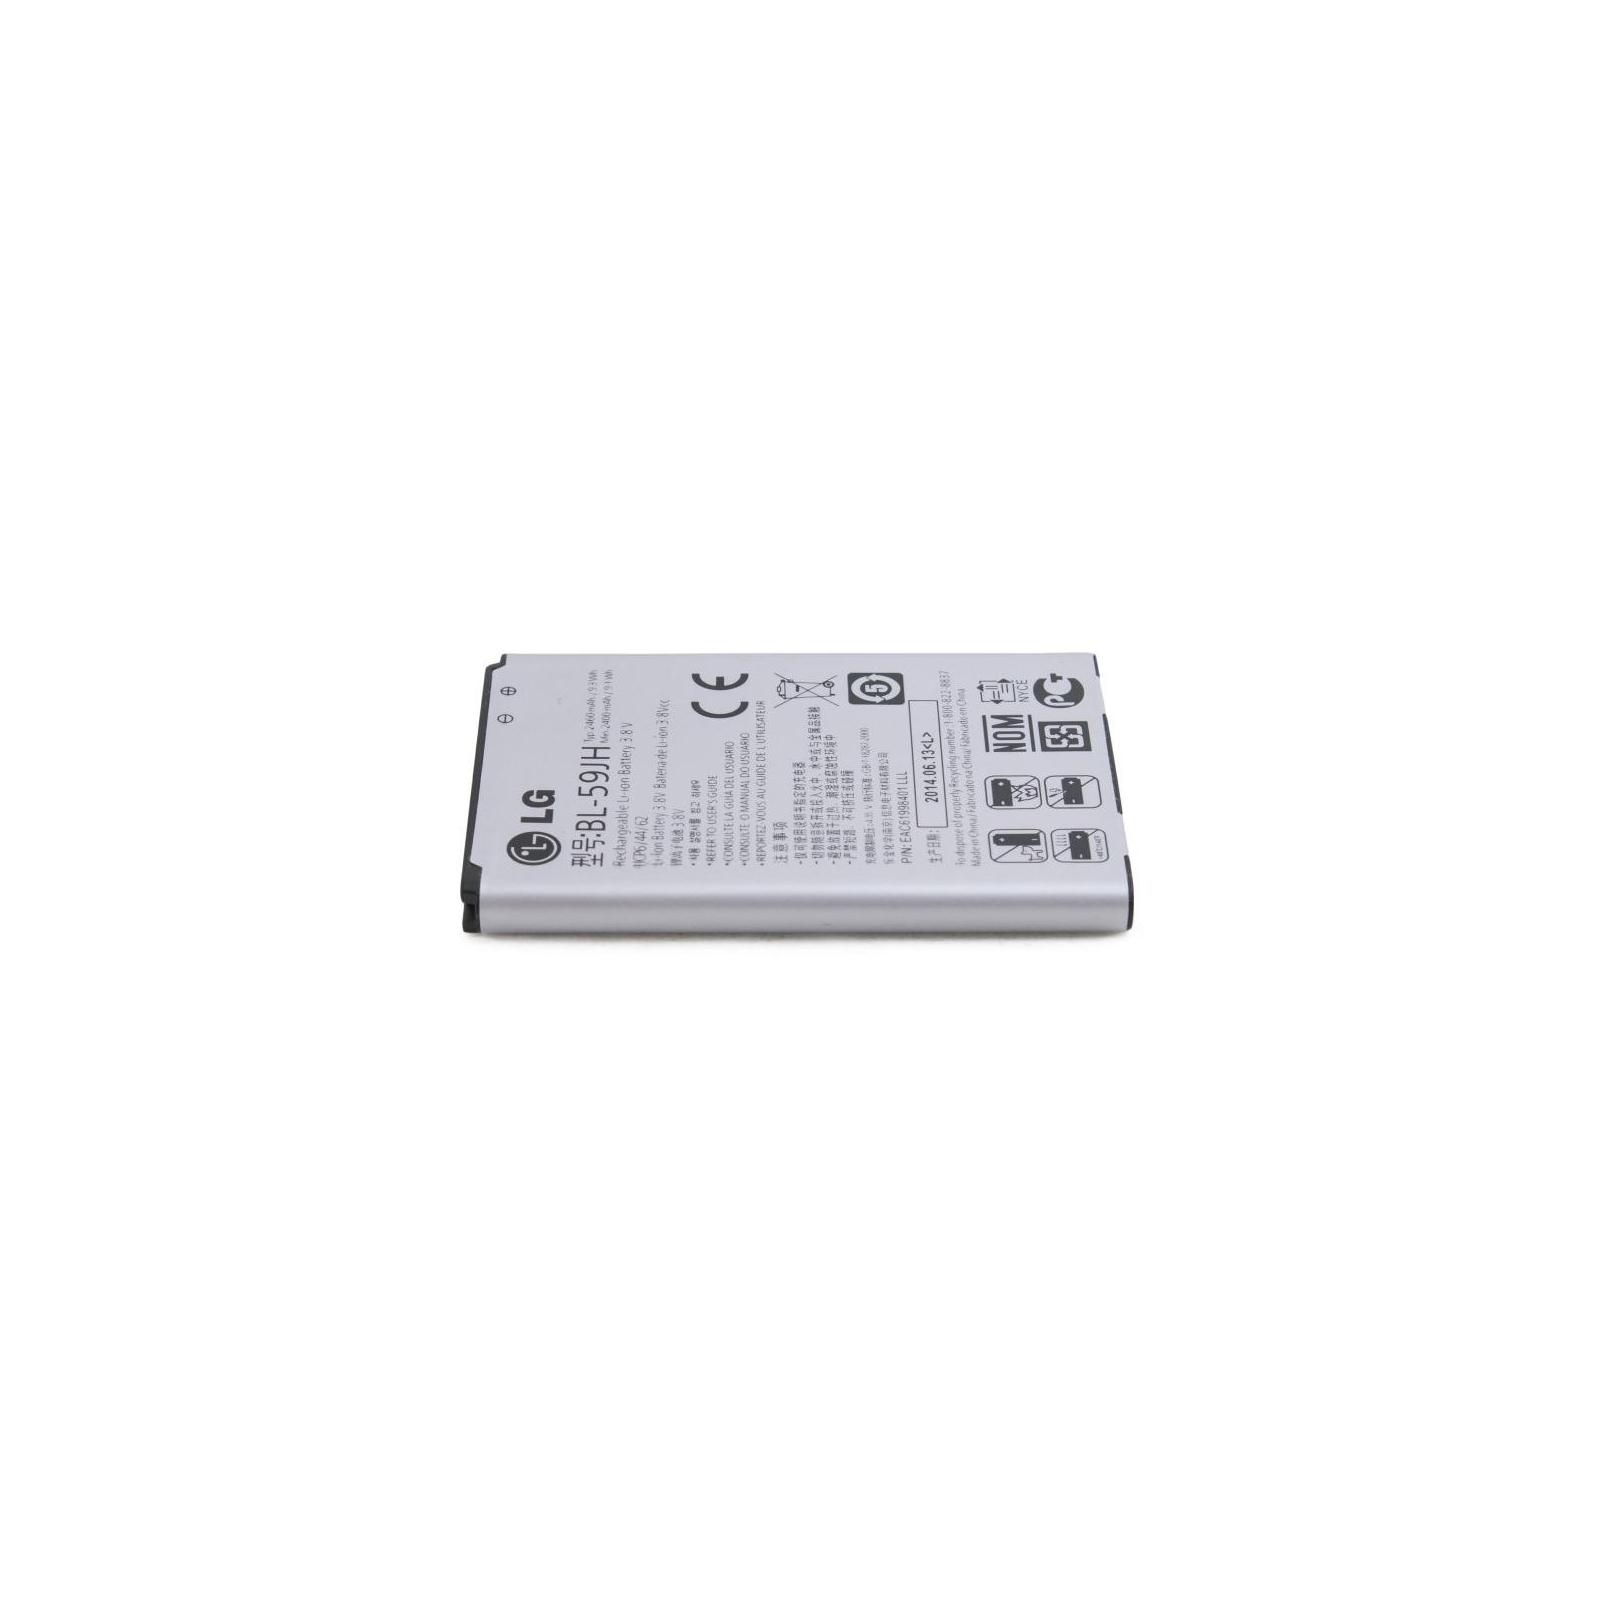 Аккумуляторная батарея EXTRADIGITAL LG Optimus L7 II Dual P715 (2460 mAh) (BML6383) изображение 6